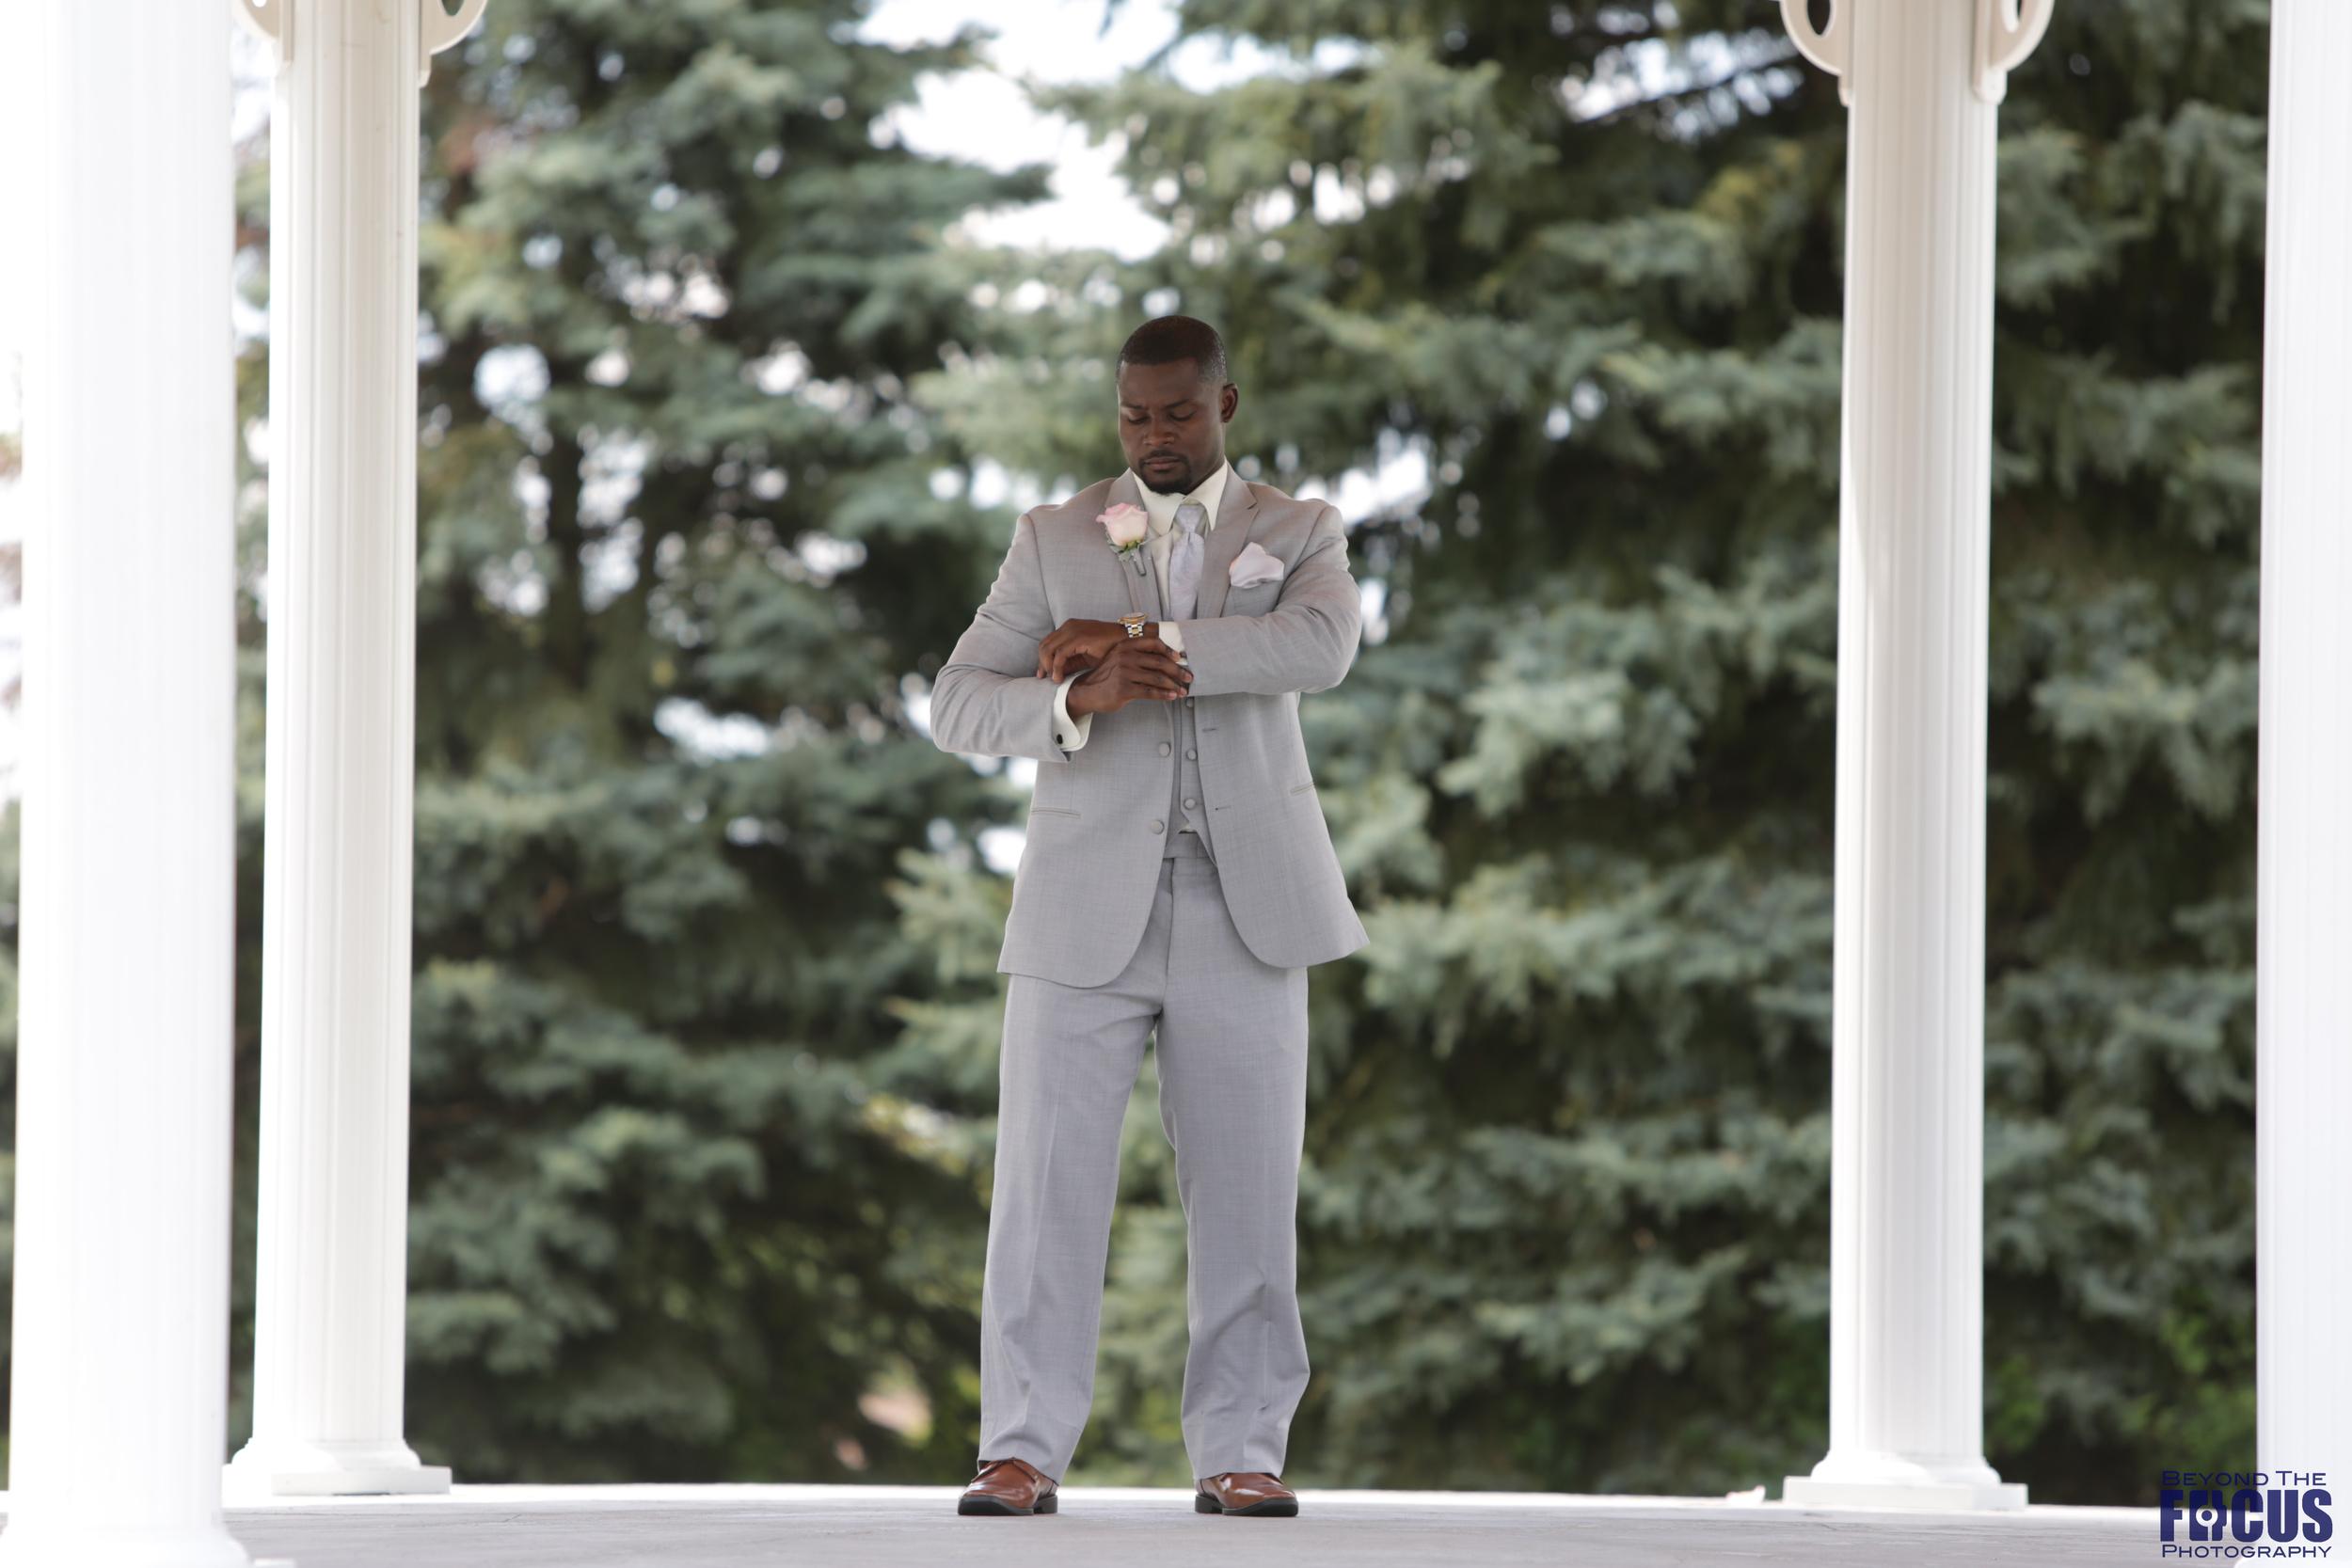 Palmer Wedding - Candids11.jpg